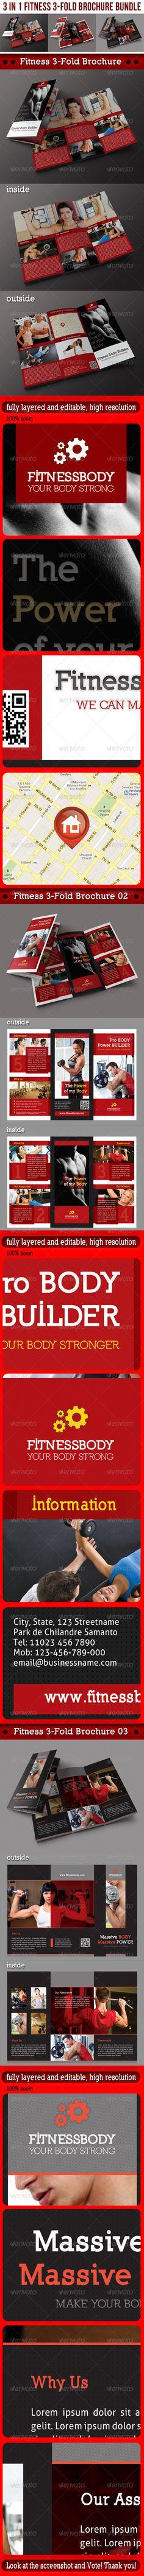 3 in 1 Fitness 3-Fold Brochure Bundle by rapidgraf Pack included:  3 Fitness 3-Fold Brochures Fully Layered PSD files Well organized folder Trifold Brochure A4 Bleed Size: